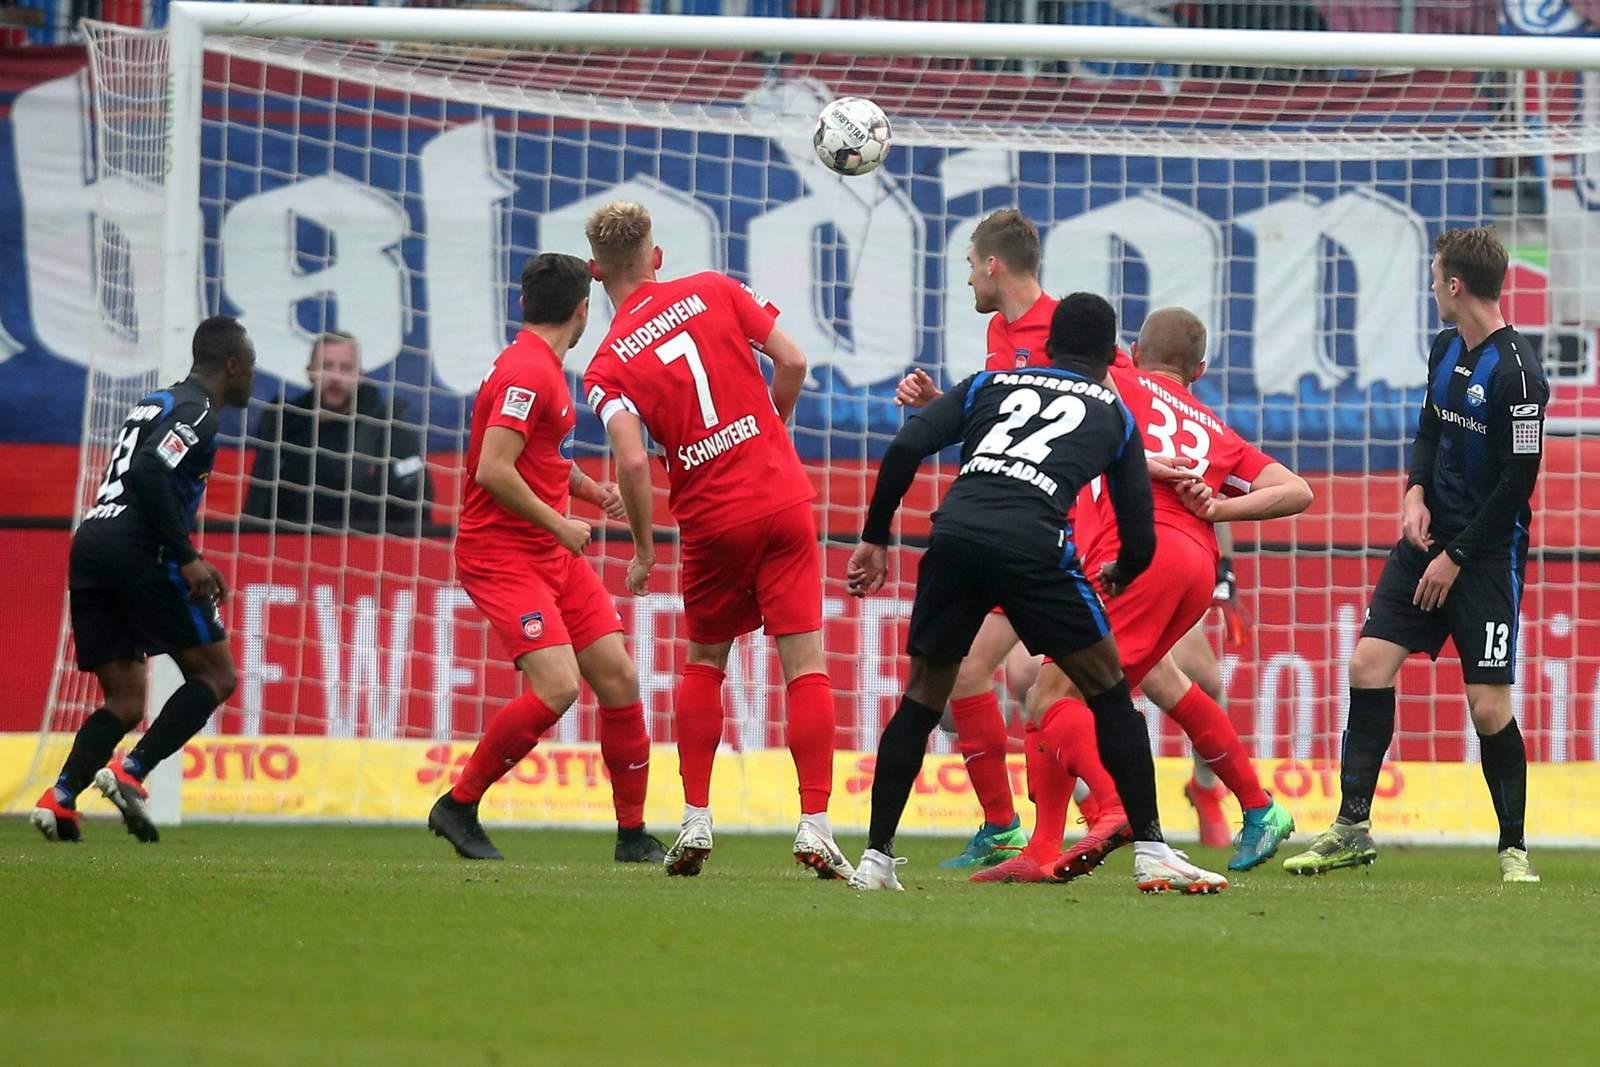 SC Paderborn, 1. FC Heidenheim